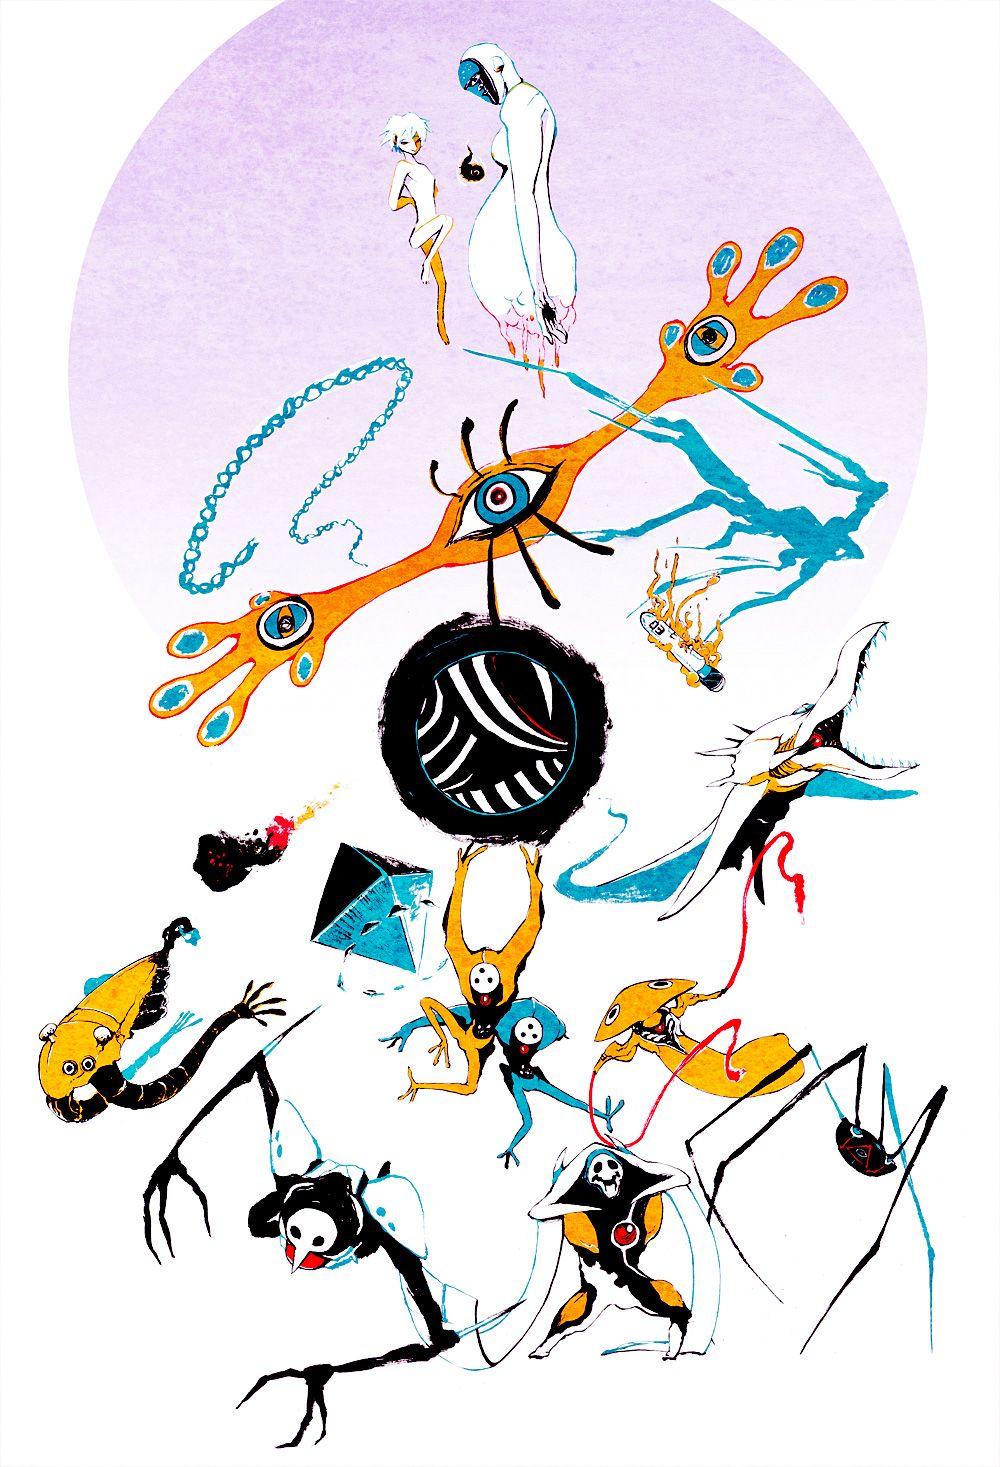 scizlor Neon genesis evangelion, Arte de anime, Neon genesis